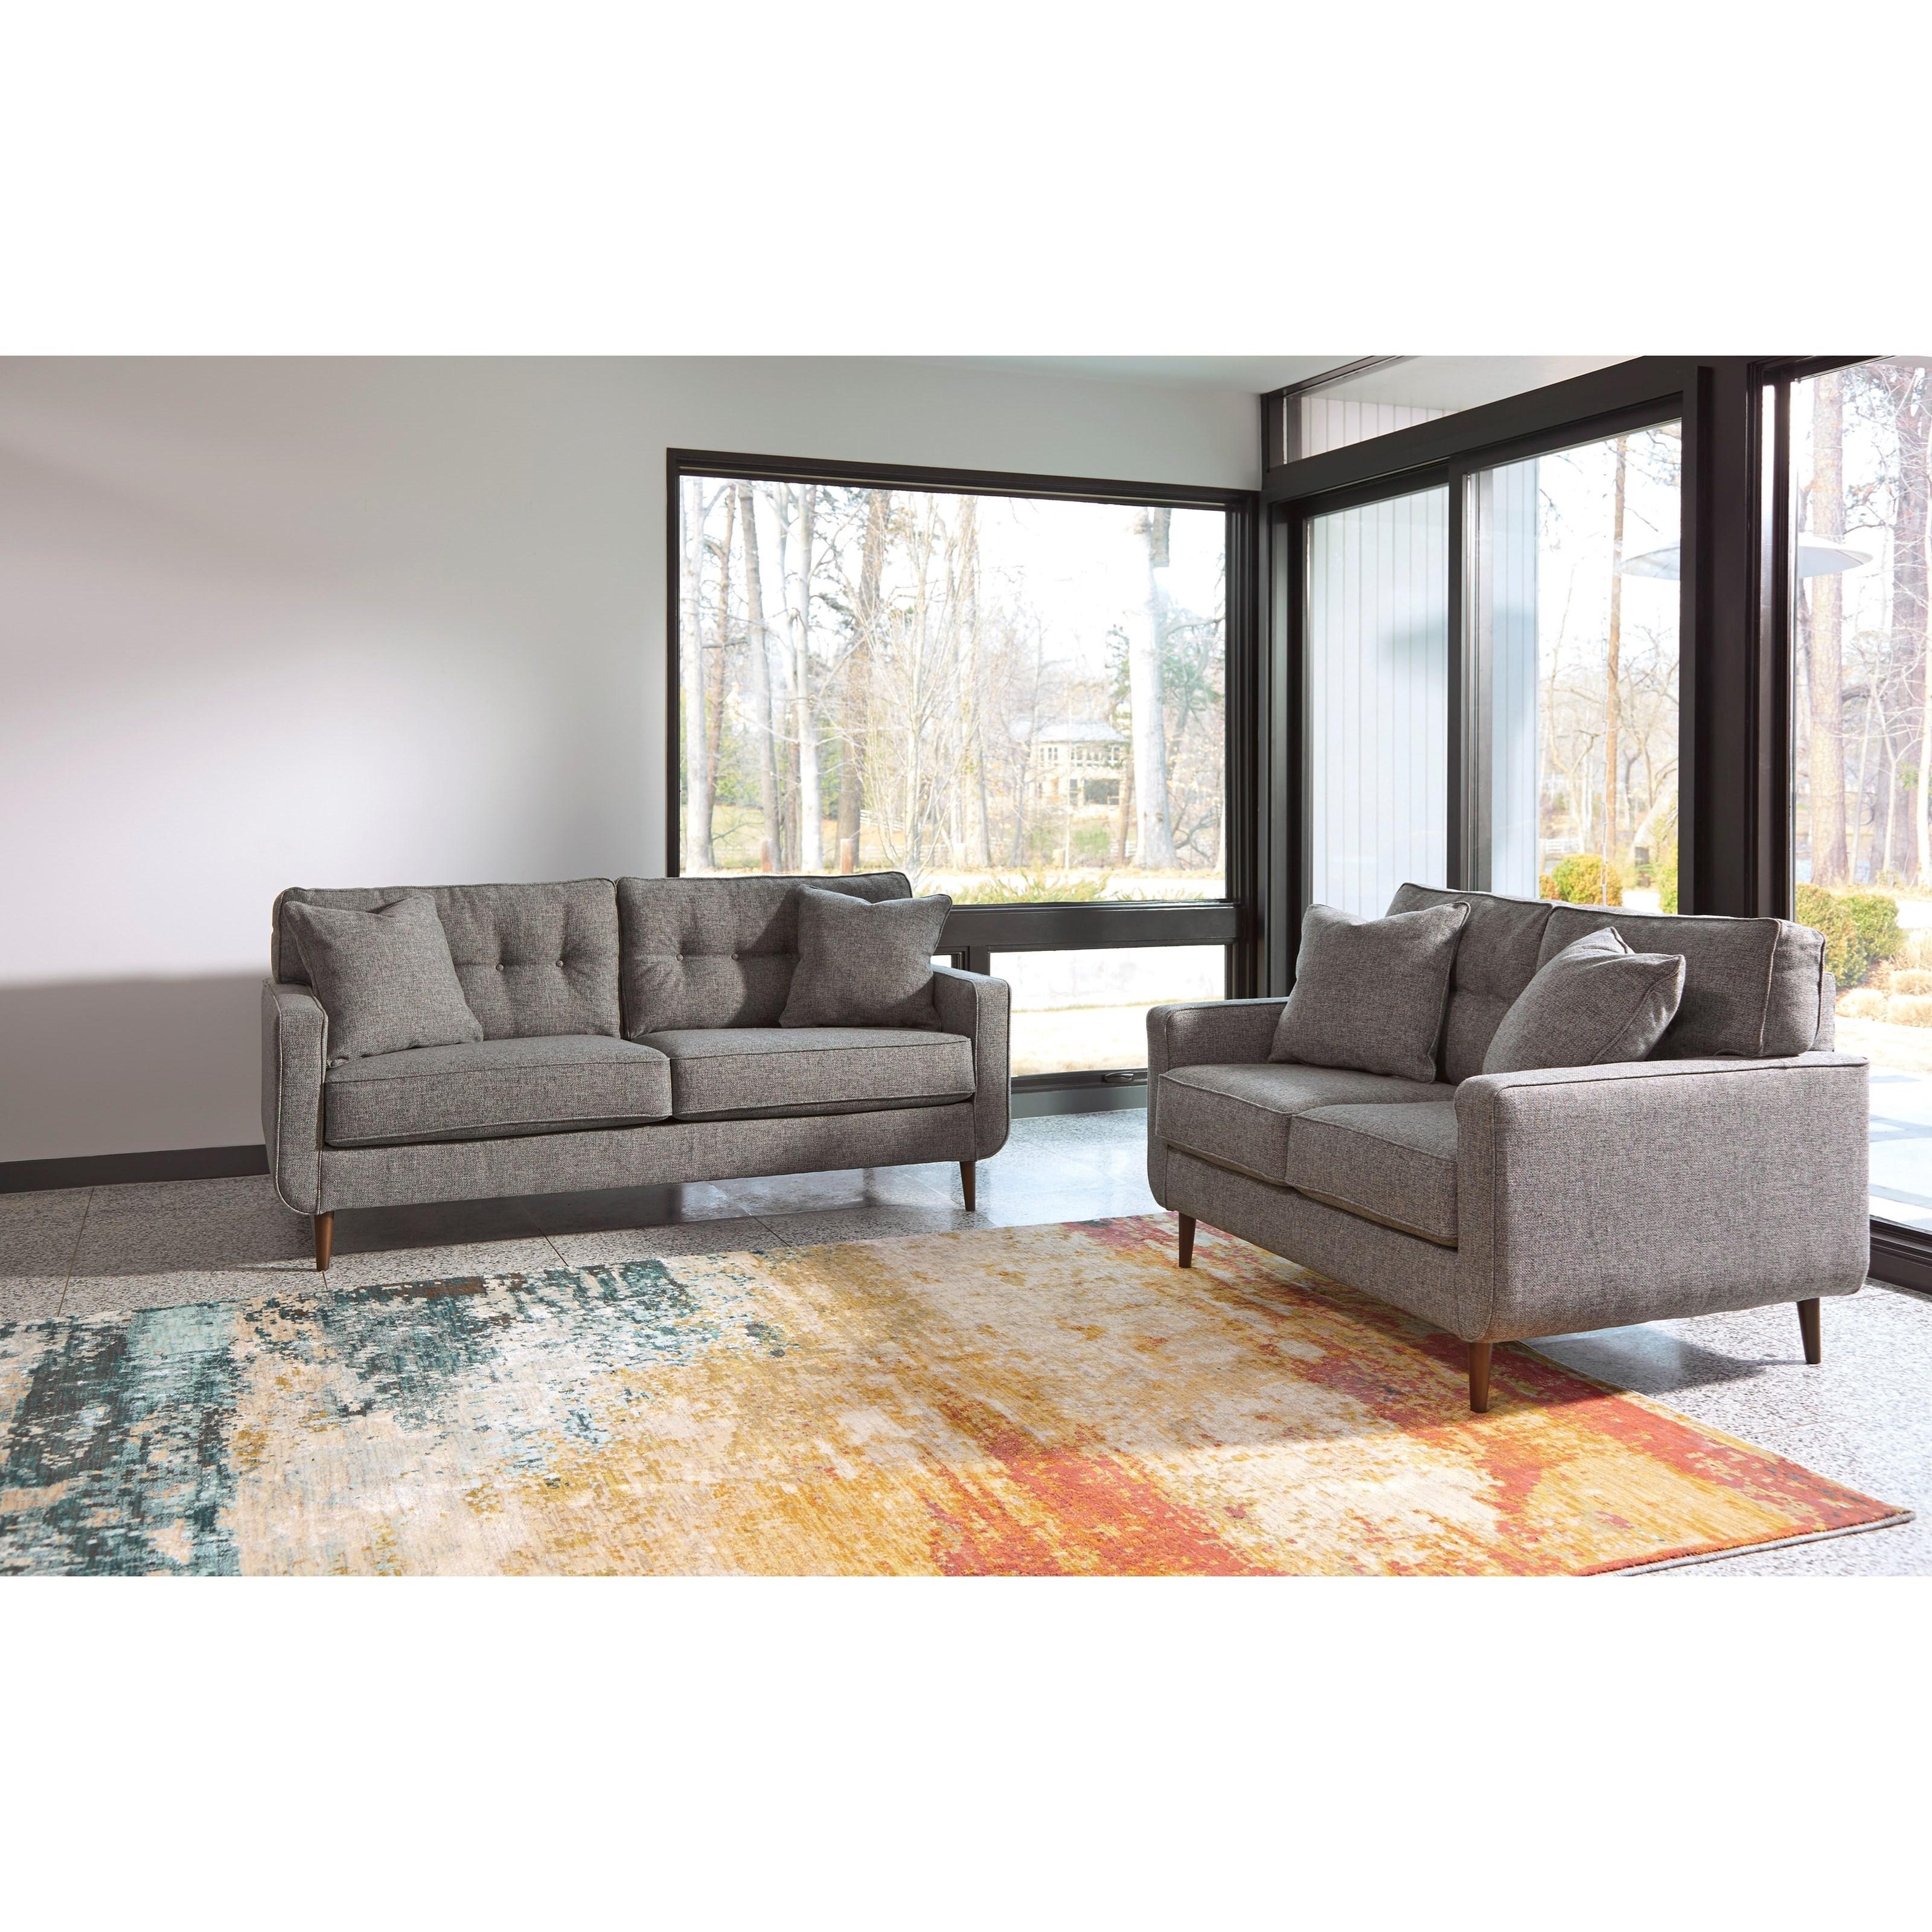 Ashley furniture zardoni stationary living room group for Living room group sets